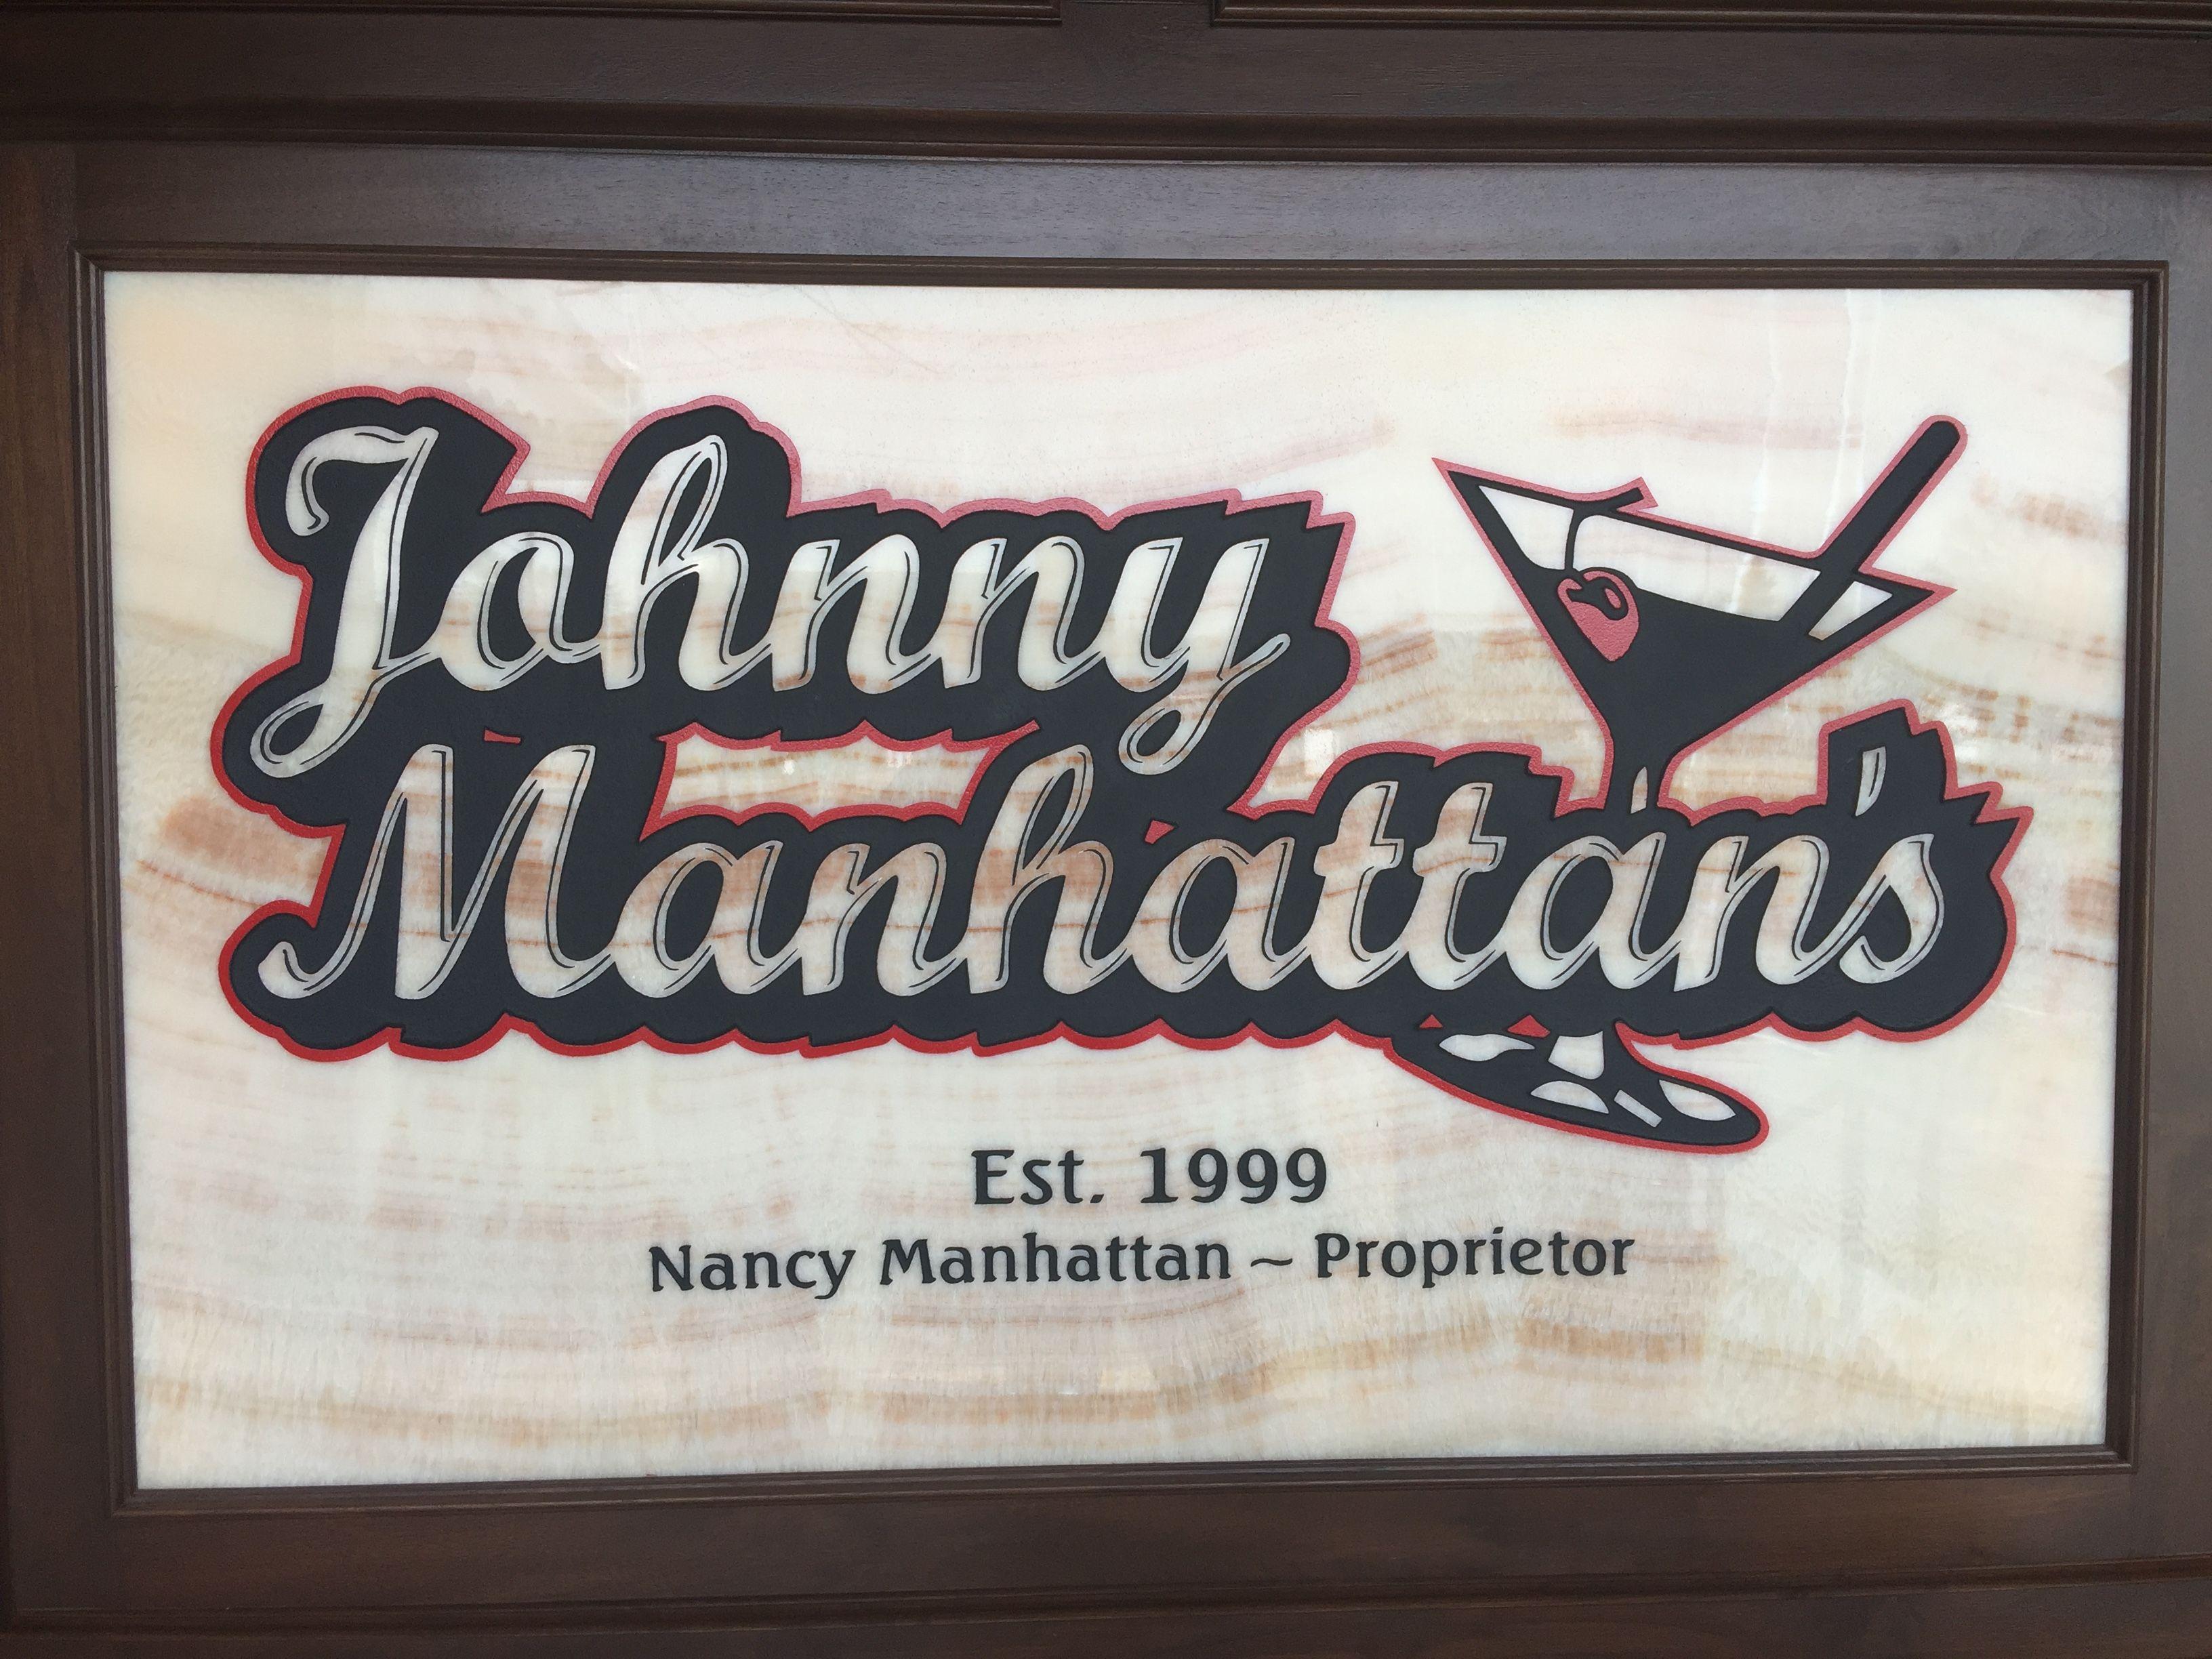 Pin by Johnny Manhattan's on Johnny Manhattan's